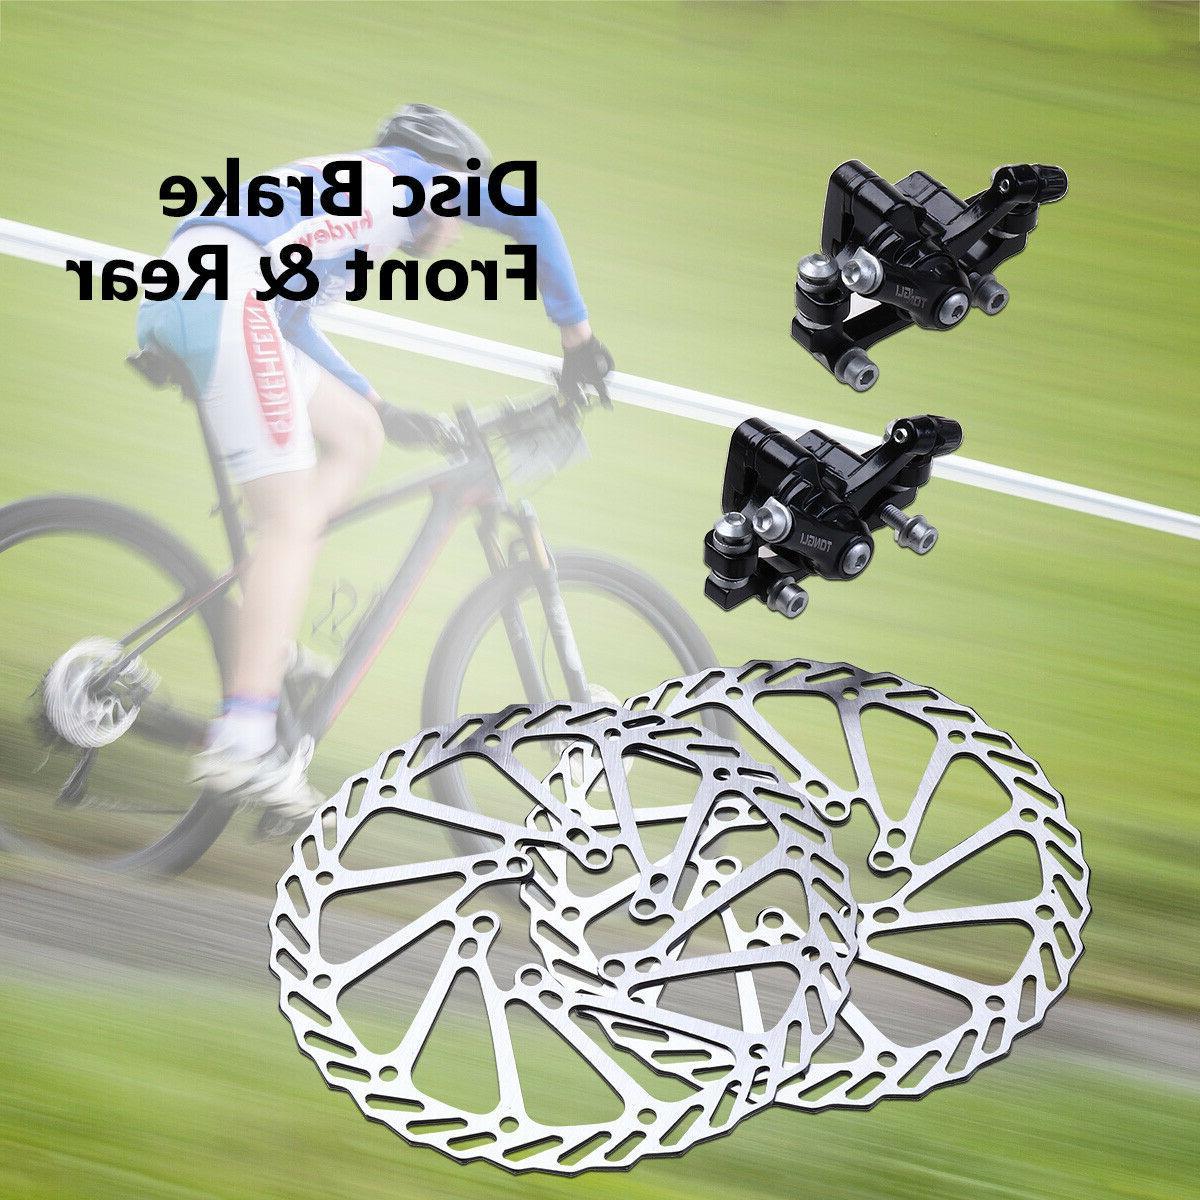 Bicycle Disk Caliper 160mm Rotor Rear